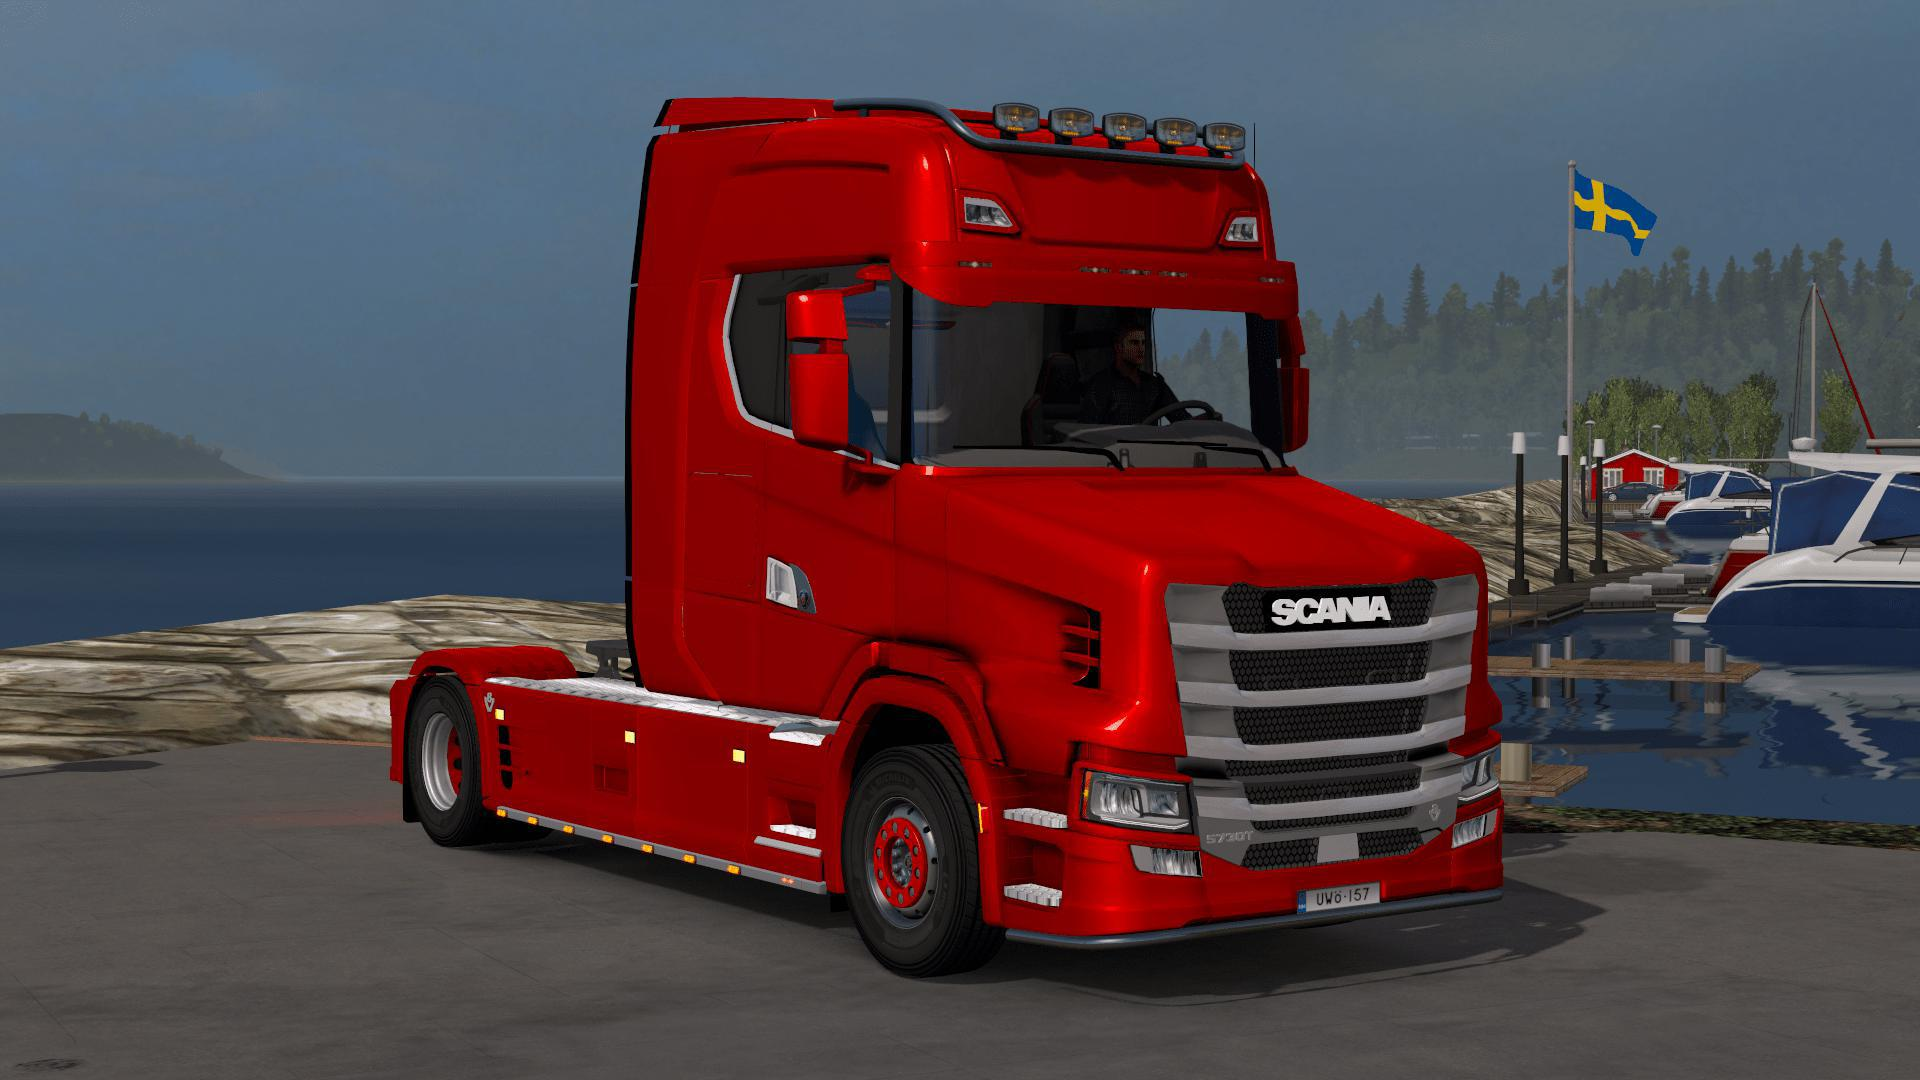 ETS2 - Scania S730 T Vlaustin V4.0 (1.38.x)